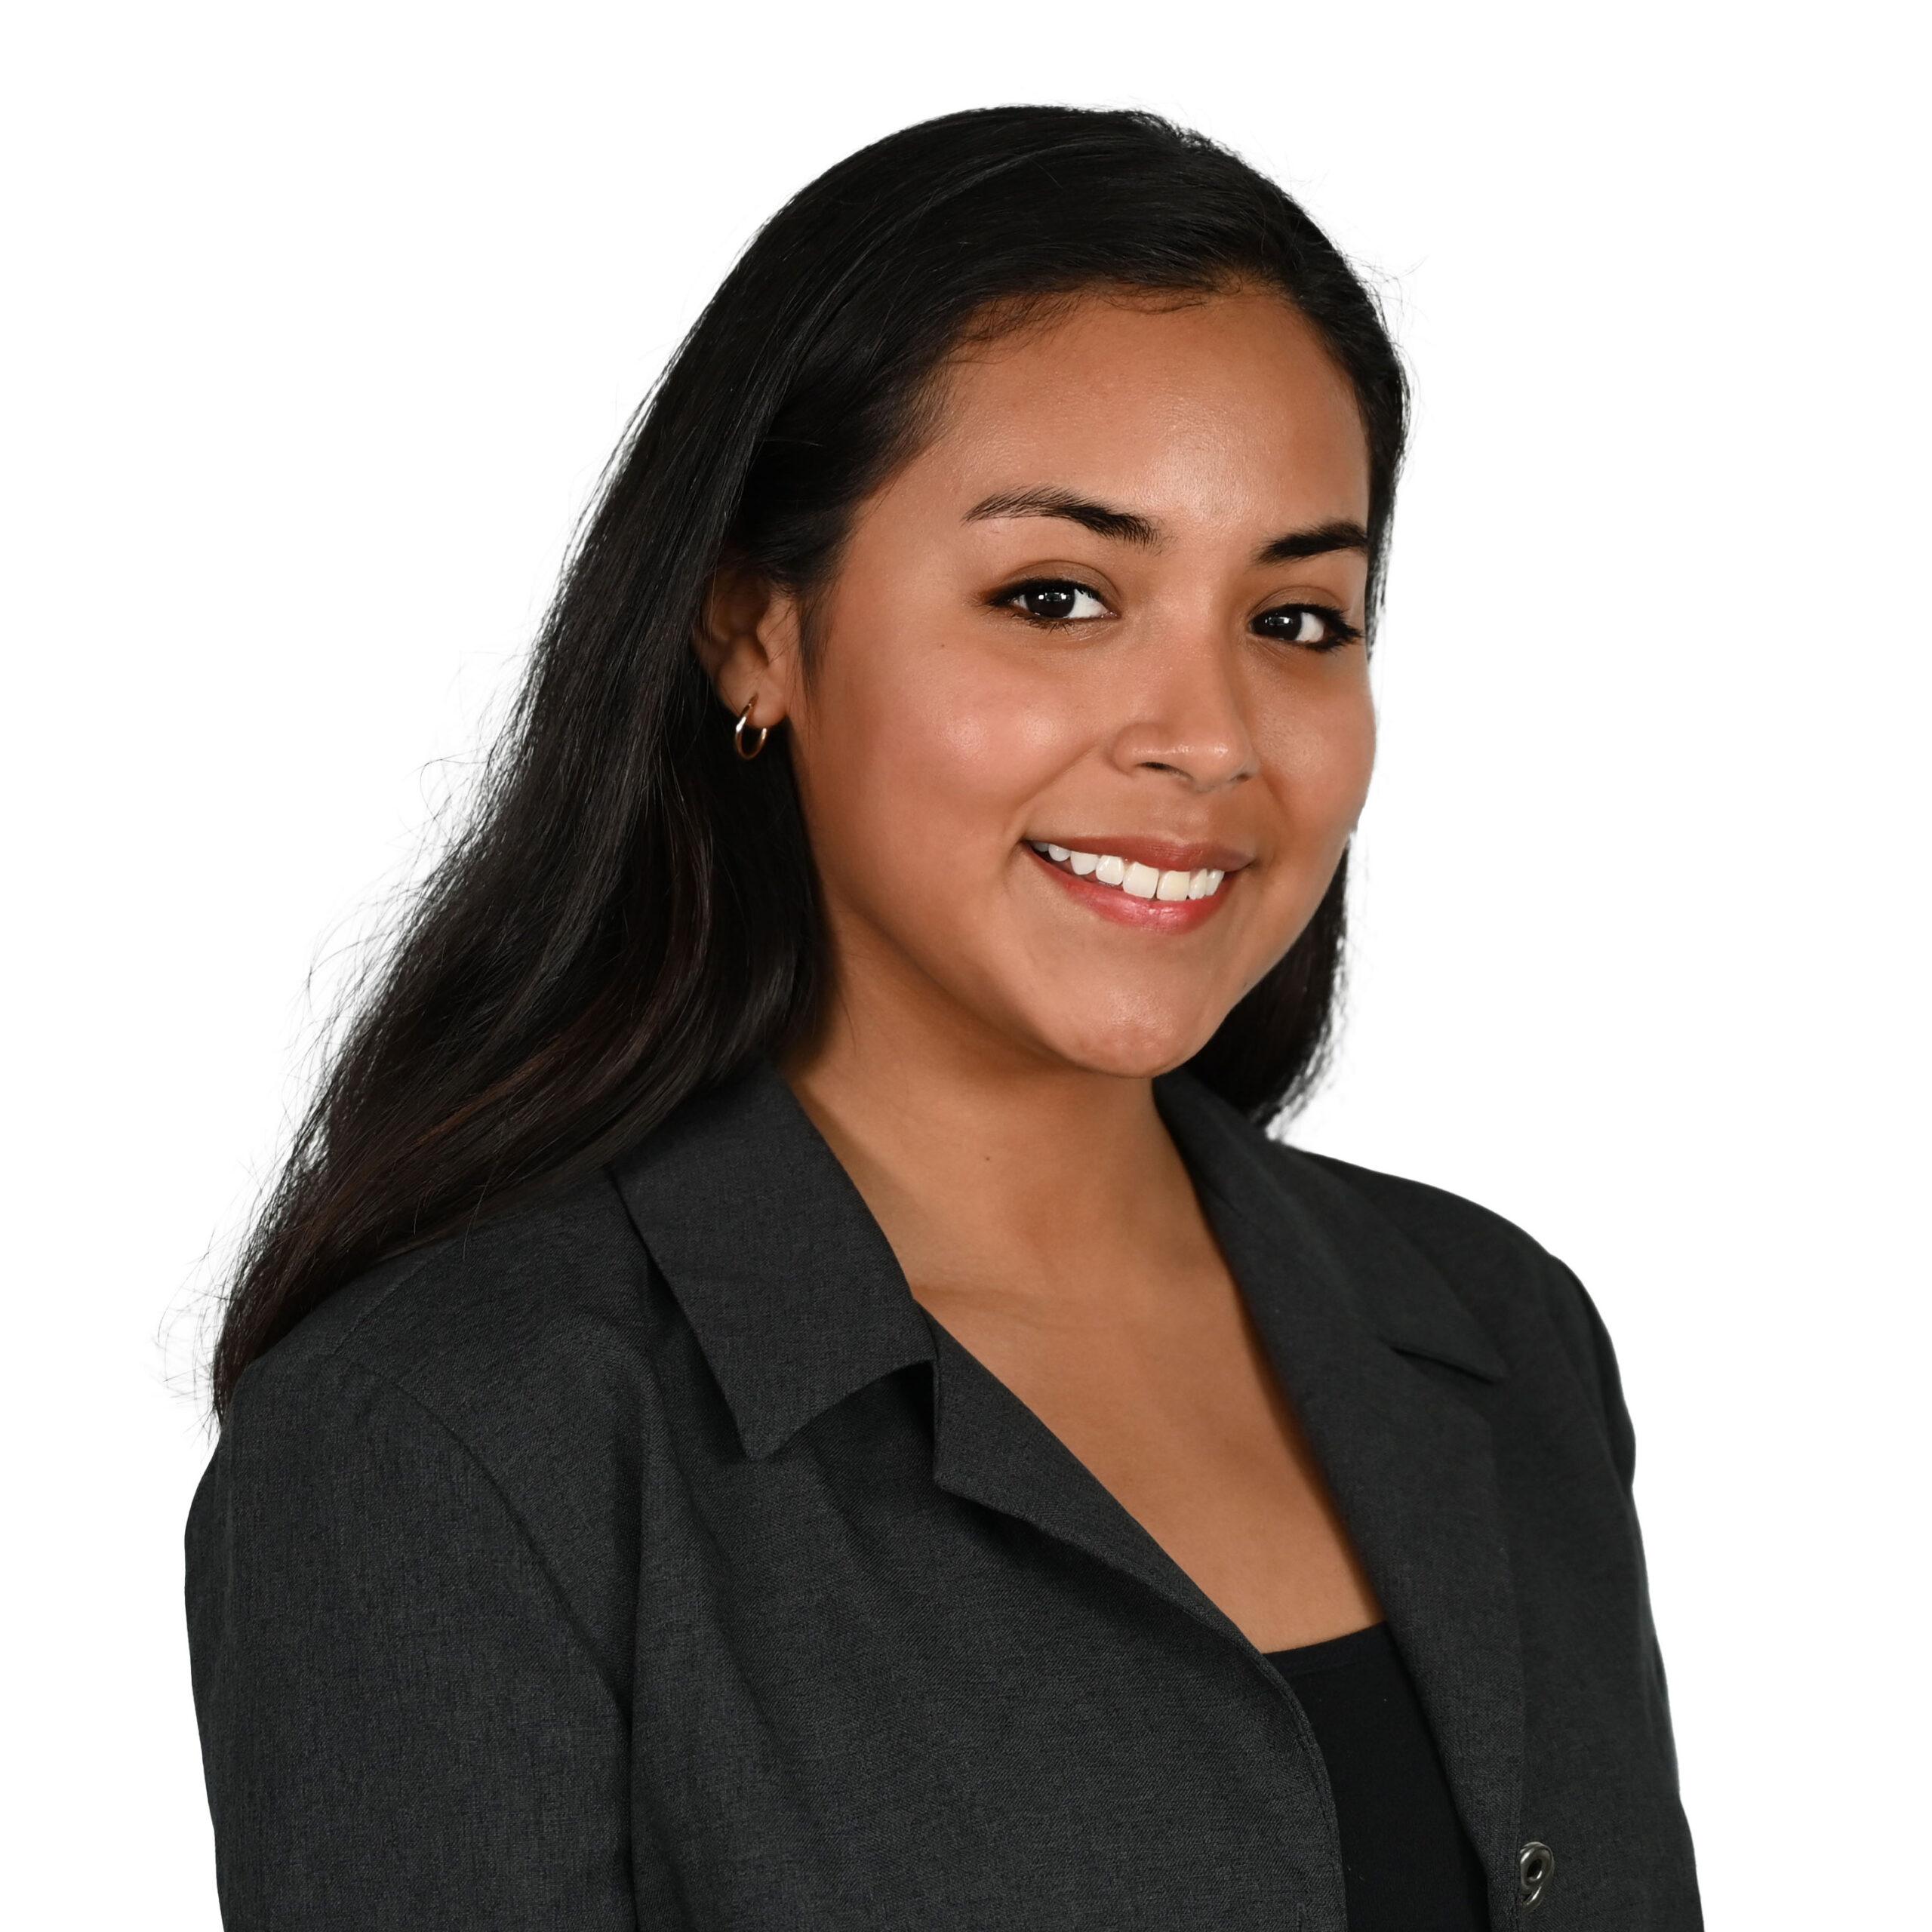 Veronica Ayala Garcia, intern at Evolve & Co.